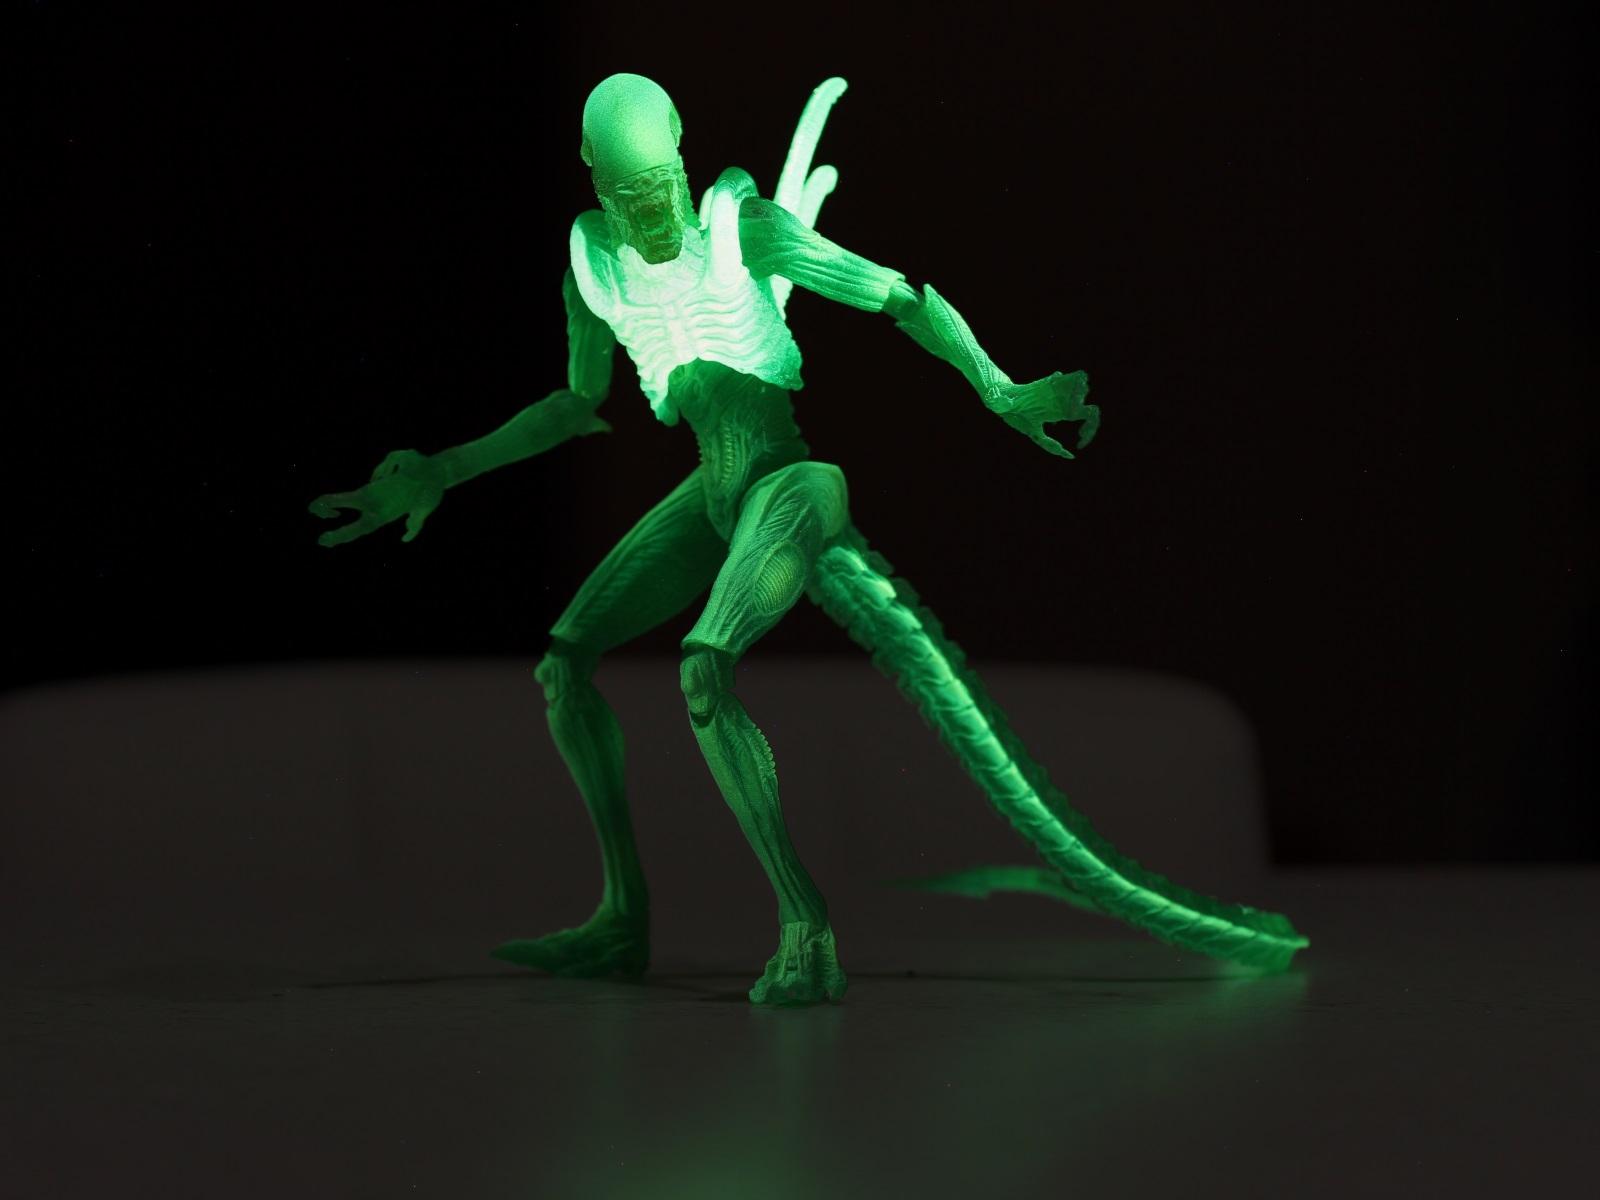 NECA AvP Thermal Vision Warrior Alien Glowing in the Dark.